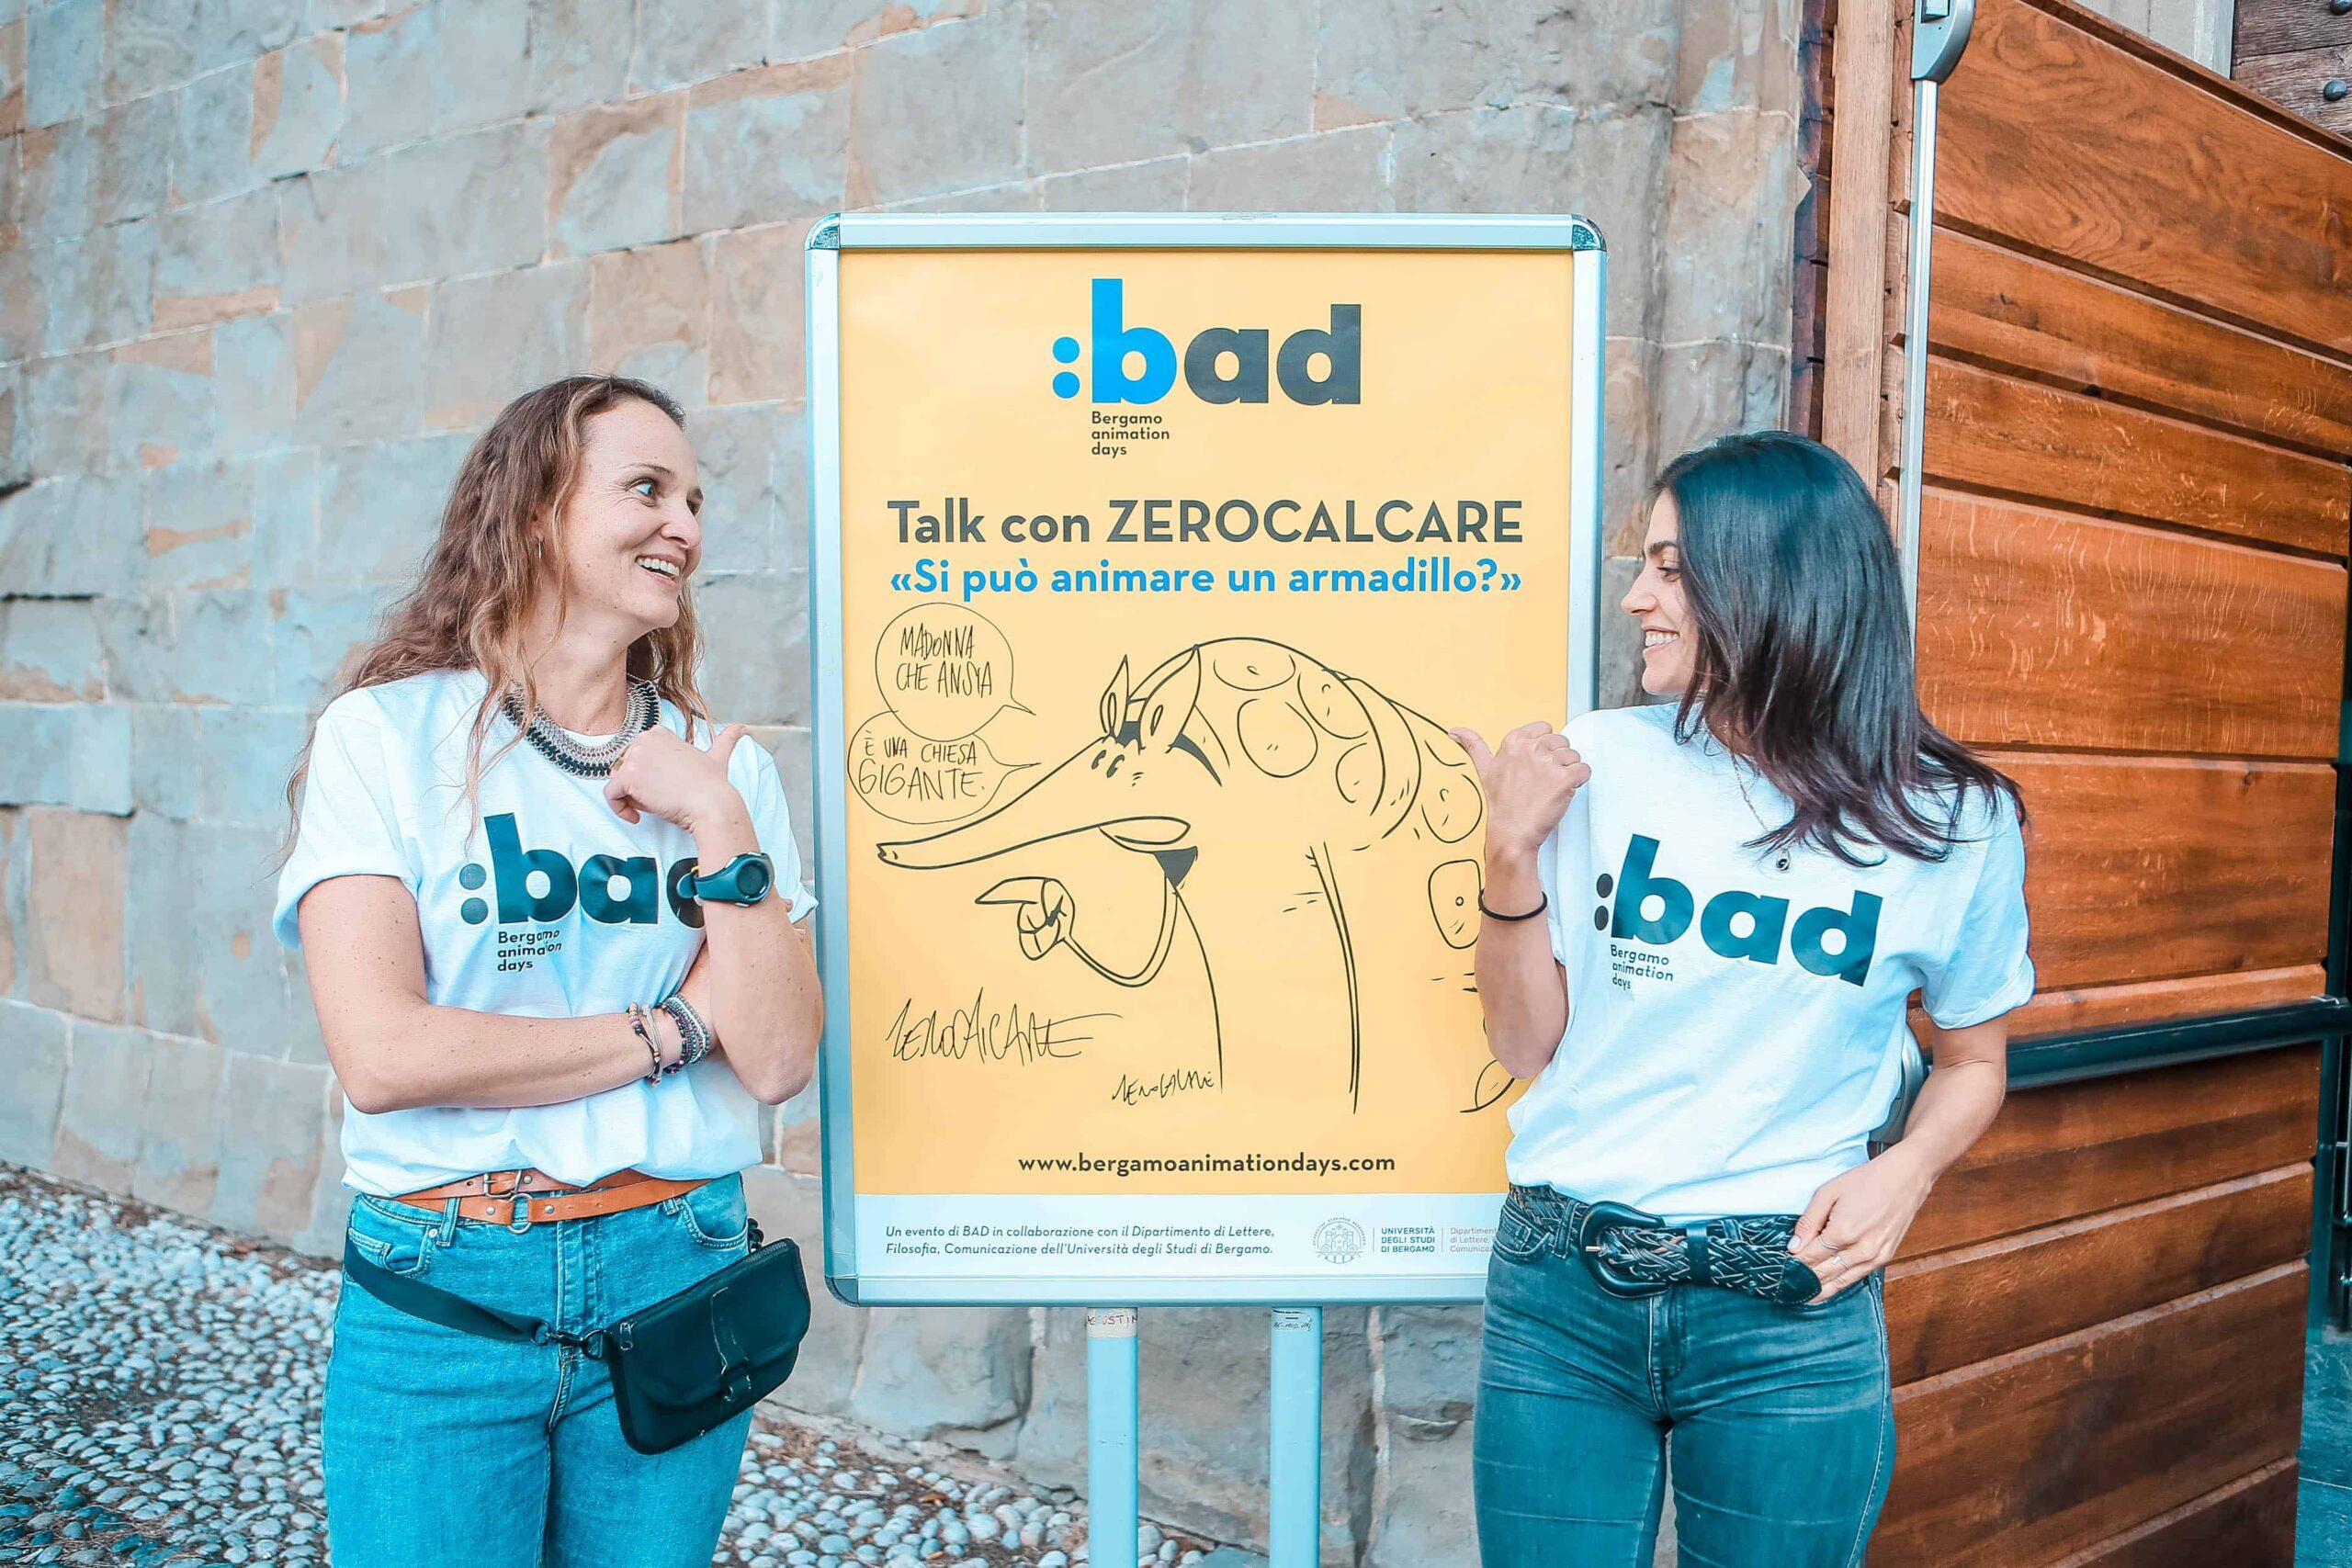 BAD_ZEROCALCARE-54